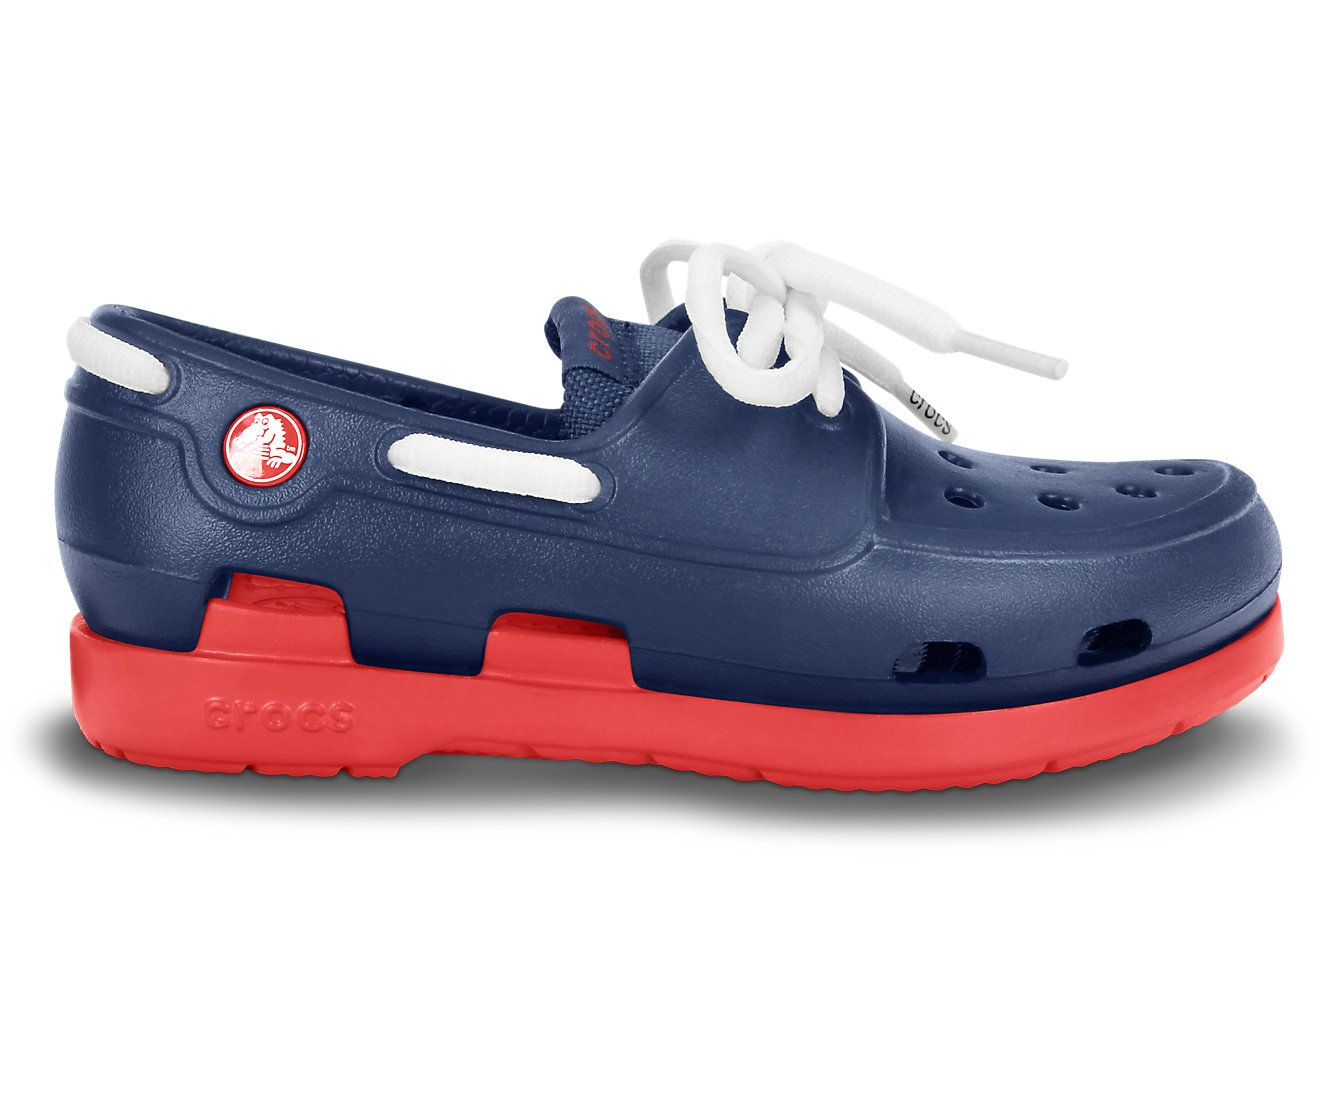 Summer Shoes | Crocs™ Summer Shoes & Sandals | $39.99 | #Summer Style #Shoes #Crocs For great summer styles, shop http://www.crocs.com/comfortable-summer-footwear/summer-shoes,default,sc.html